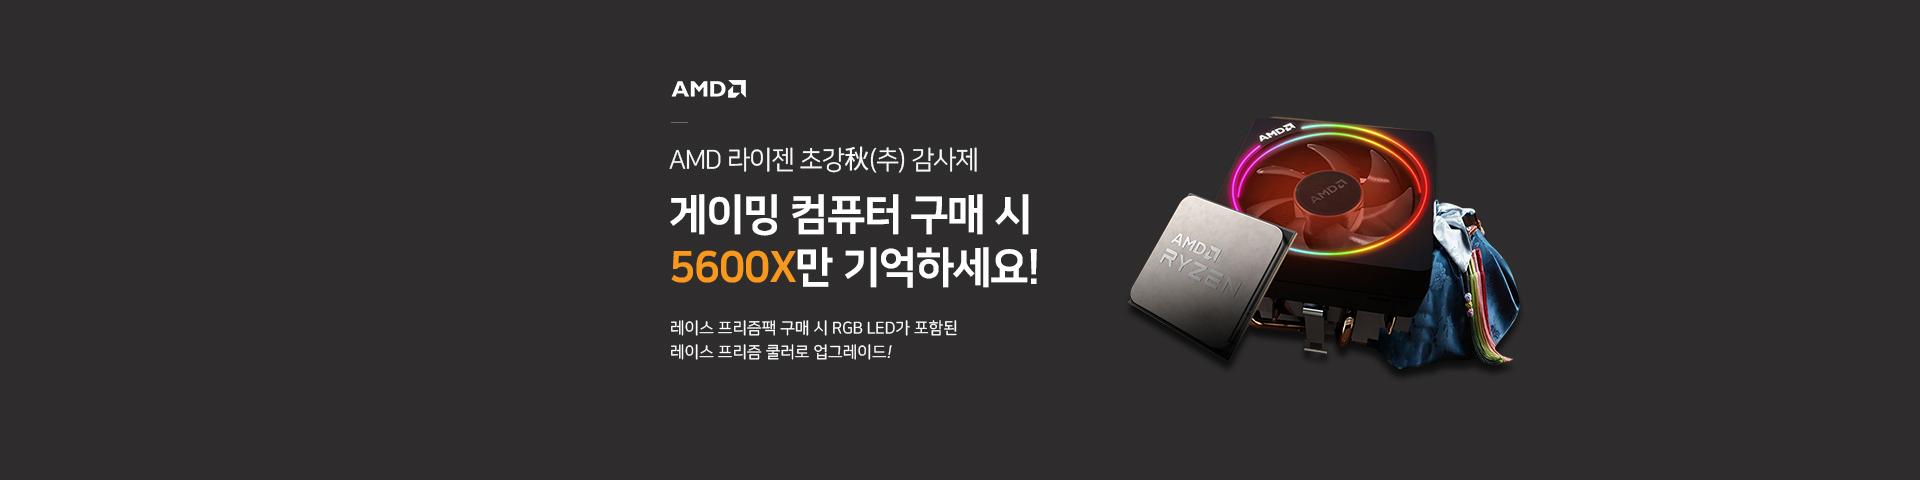 [AMD] 5600X 프리즘쿨러팩 이벤트